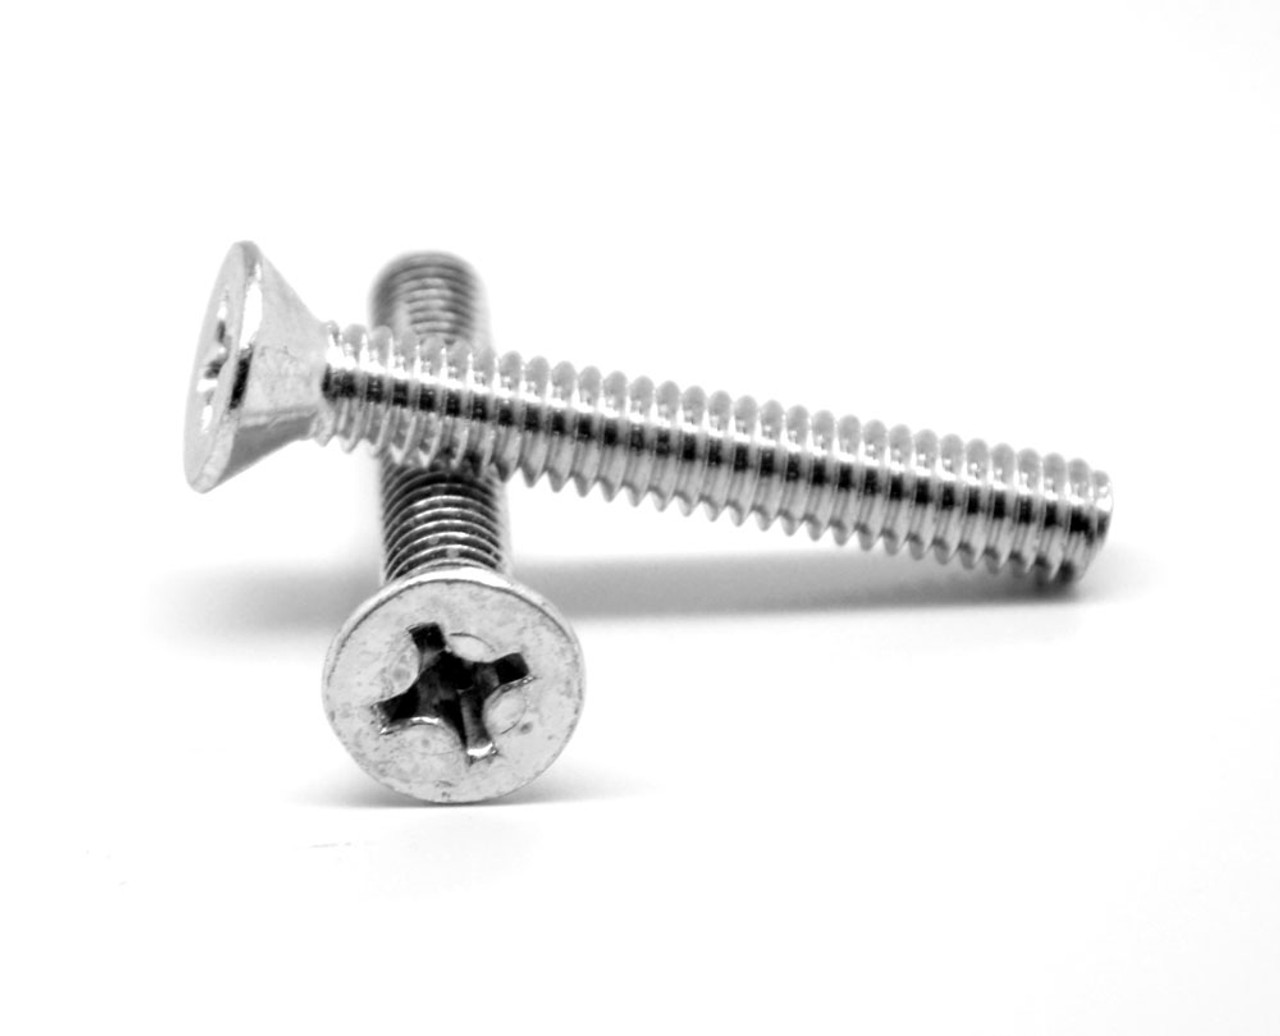 #4-40 x 3//16 Coarse Machine Screw Slotted Round Head Stainless Steel 316